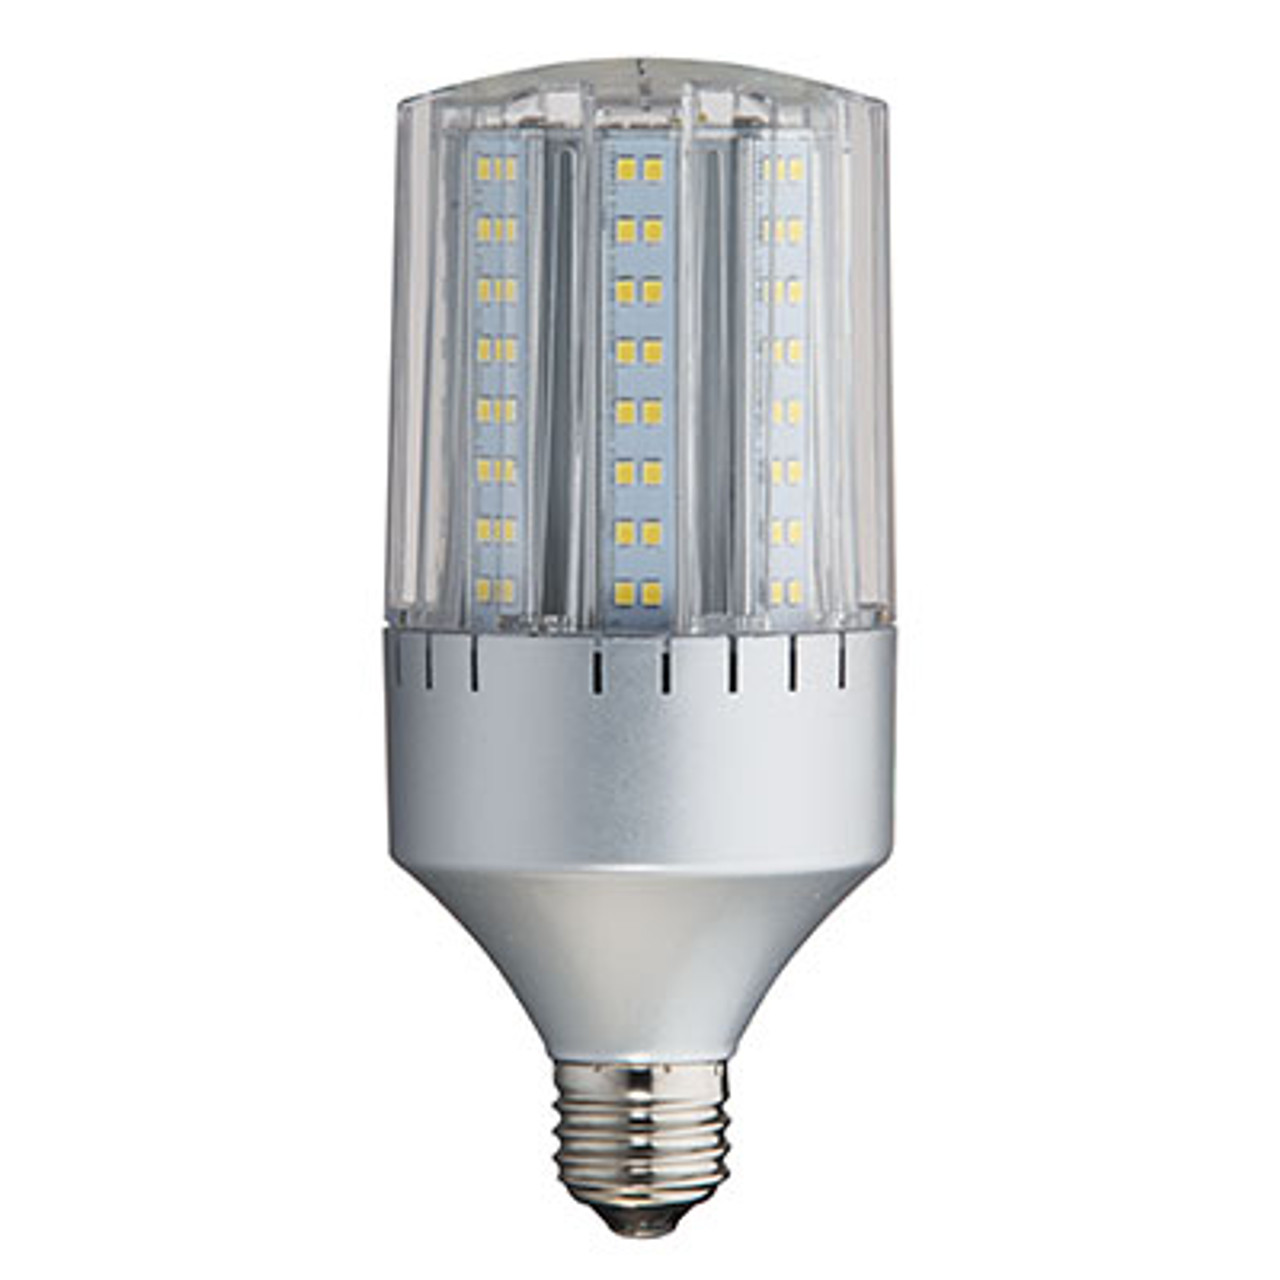 LED-8029M-A , Outdoor (Type B) Bollard LED Retrofit